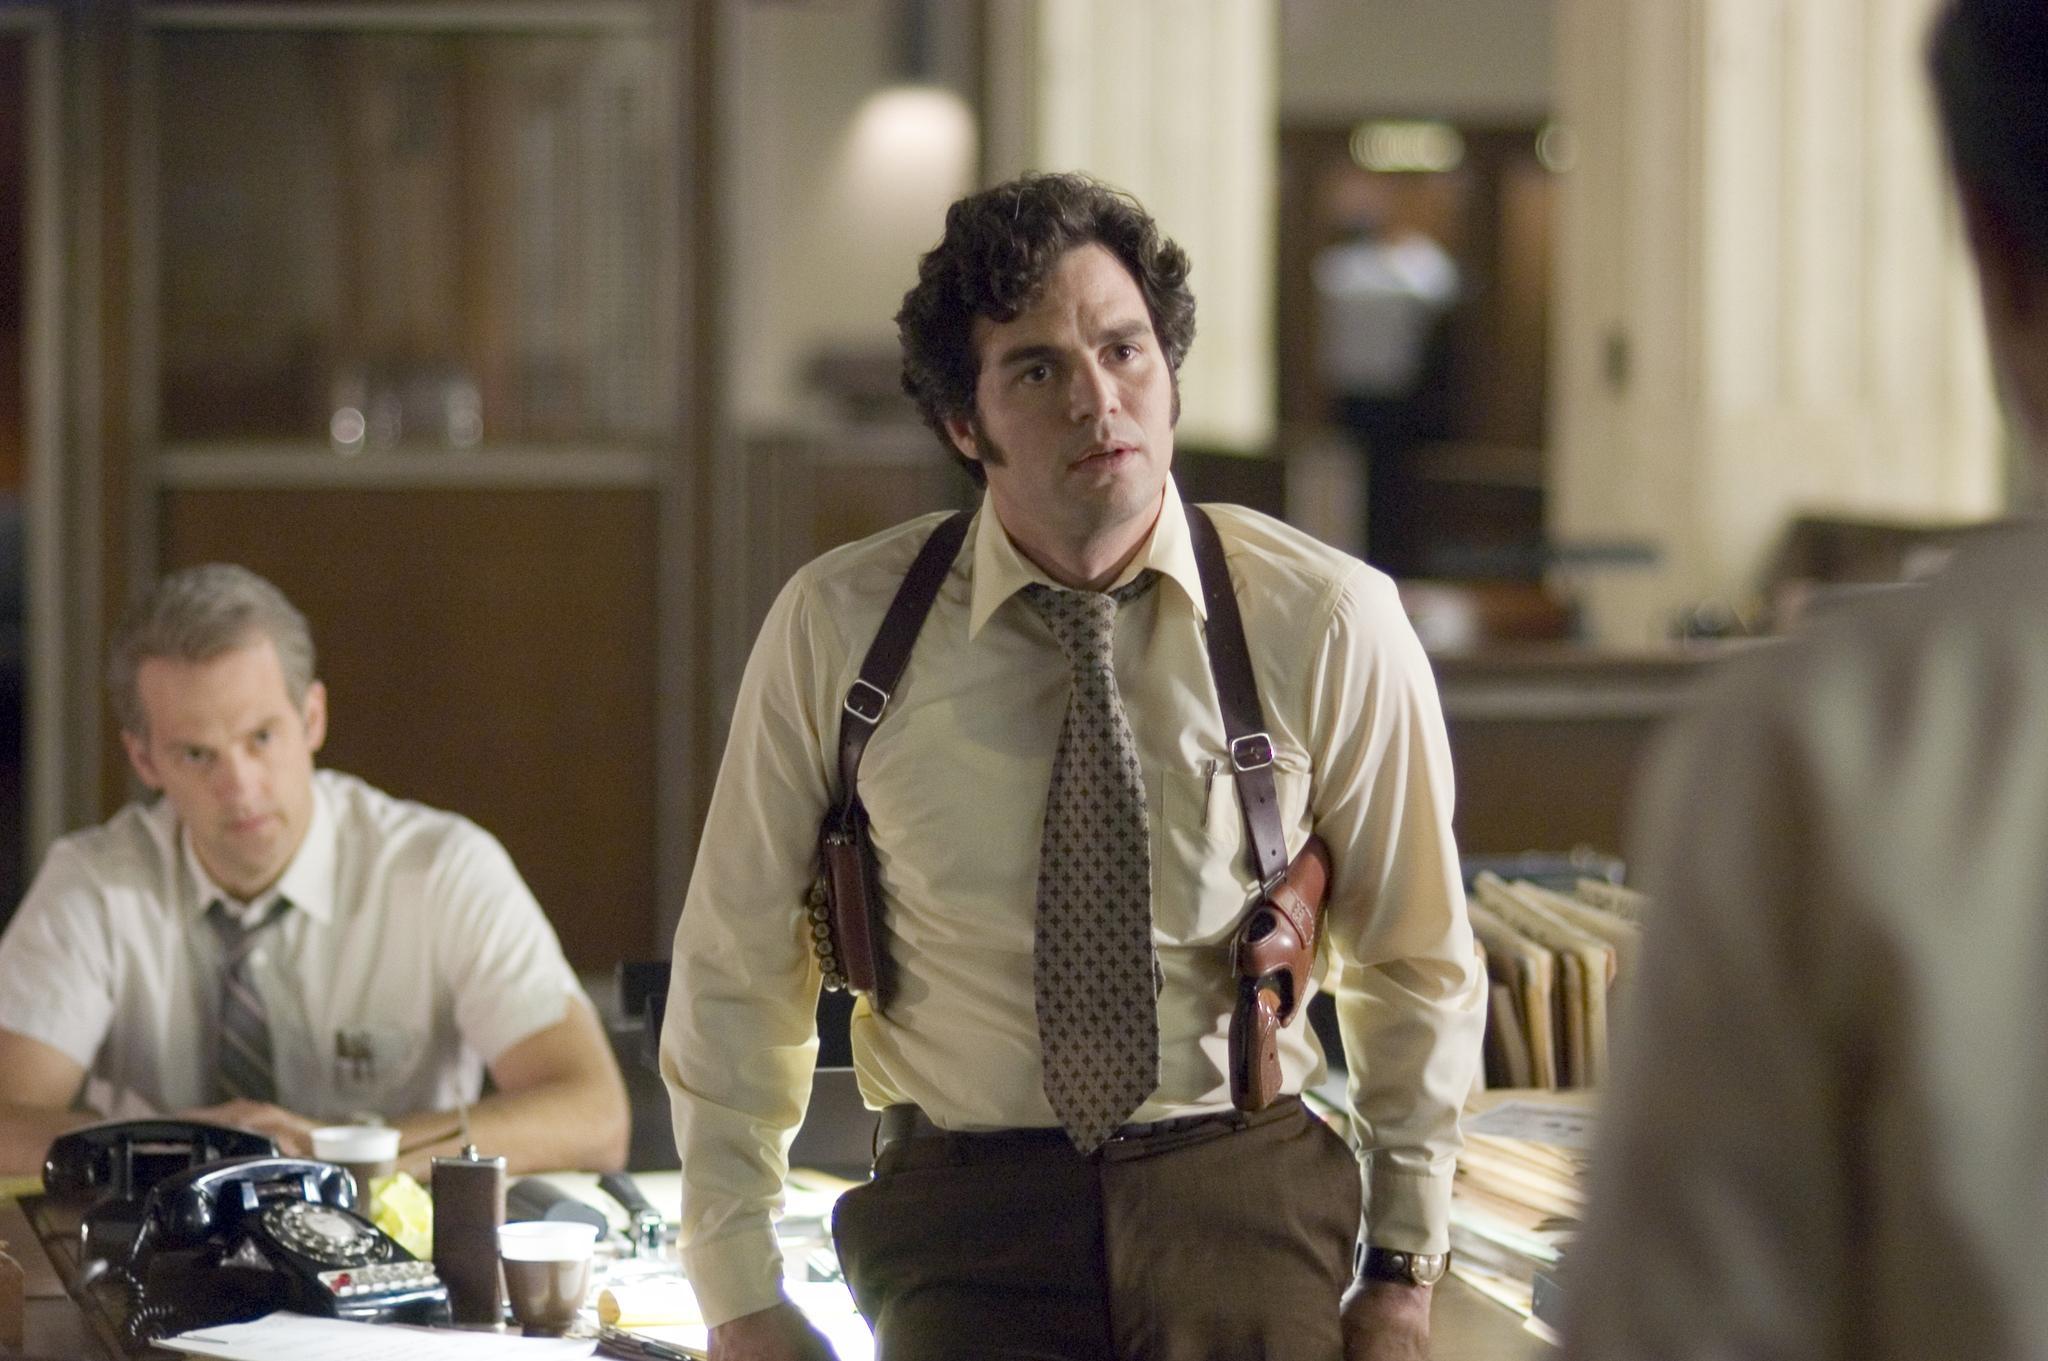 Mark Ruffalo as police detective David Toschi in Zodiac (2007)